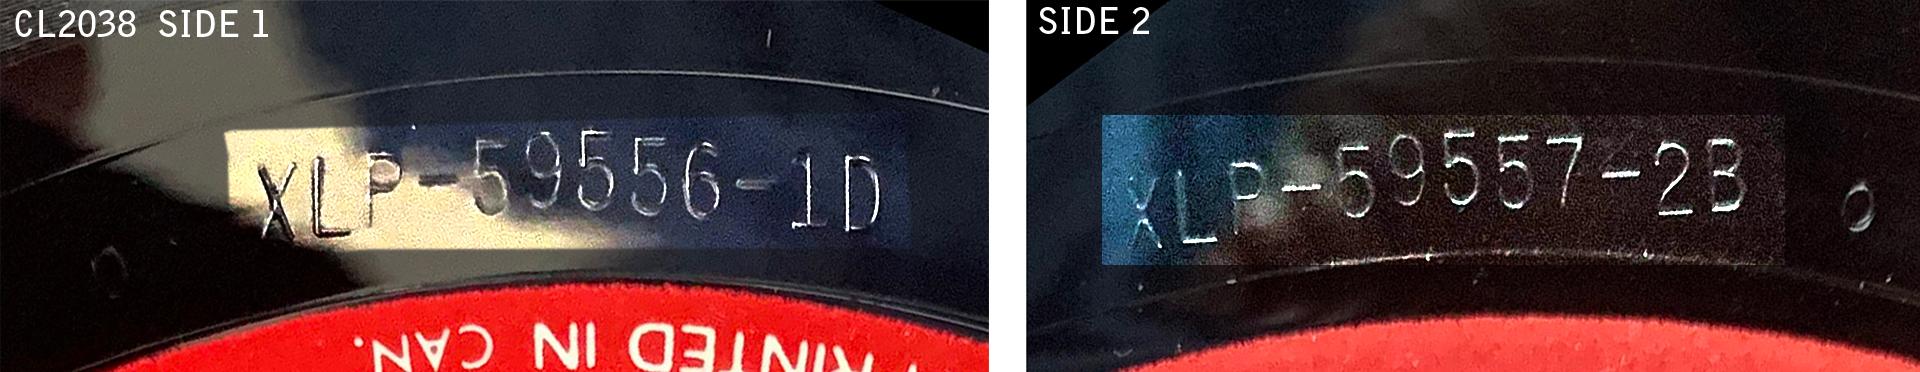 CL2038-Matrix-Side1-Side-2-CLOSEUP